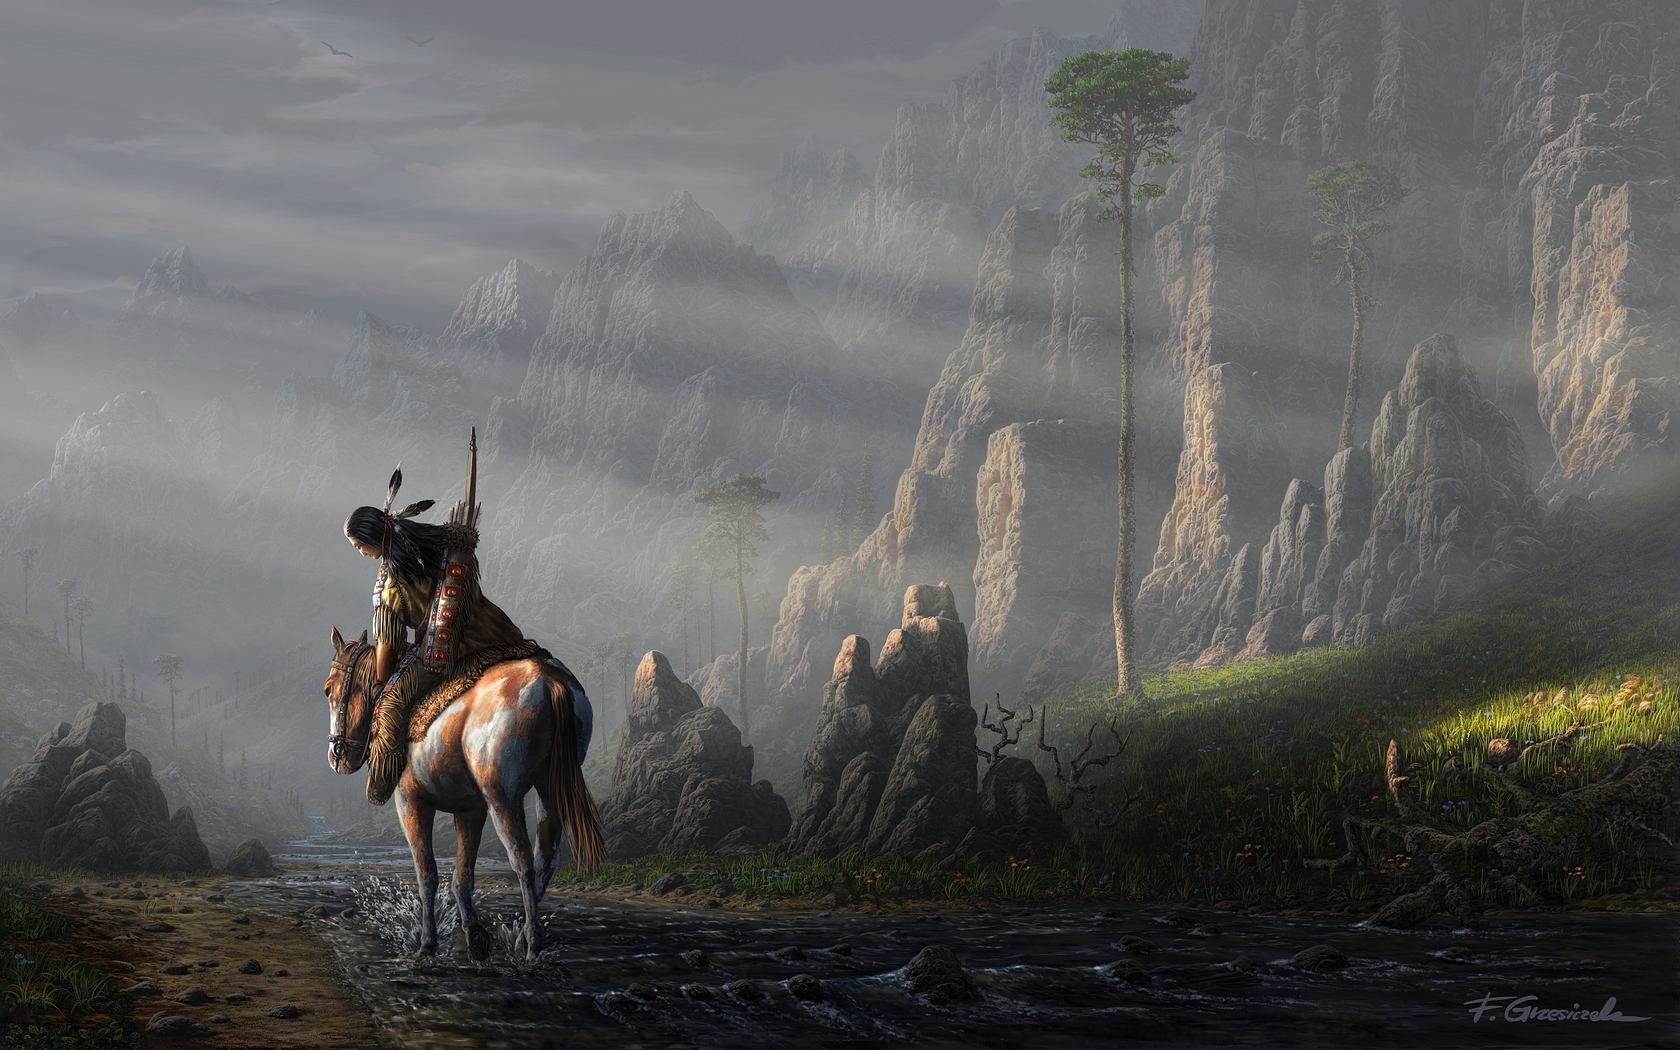 Free Download Artistic Native American Wallpaper 1680x1050